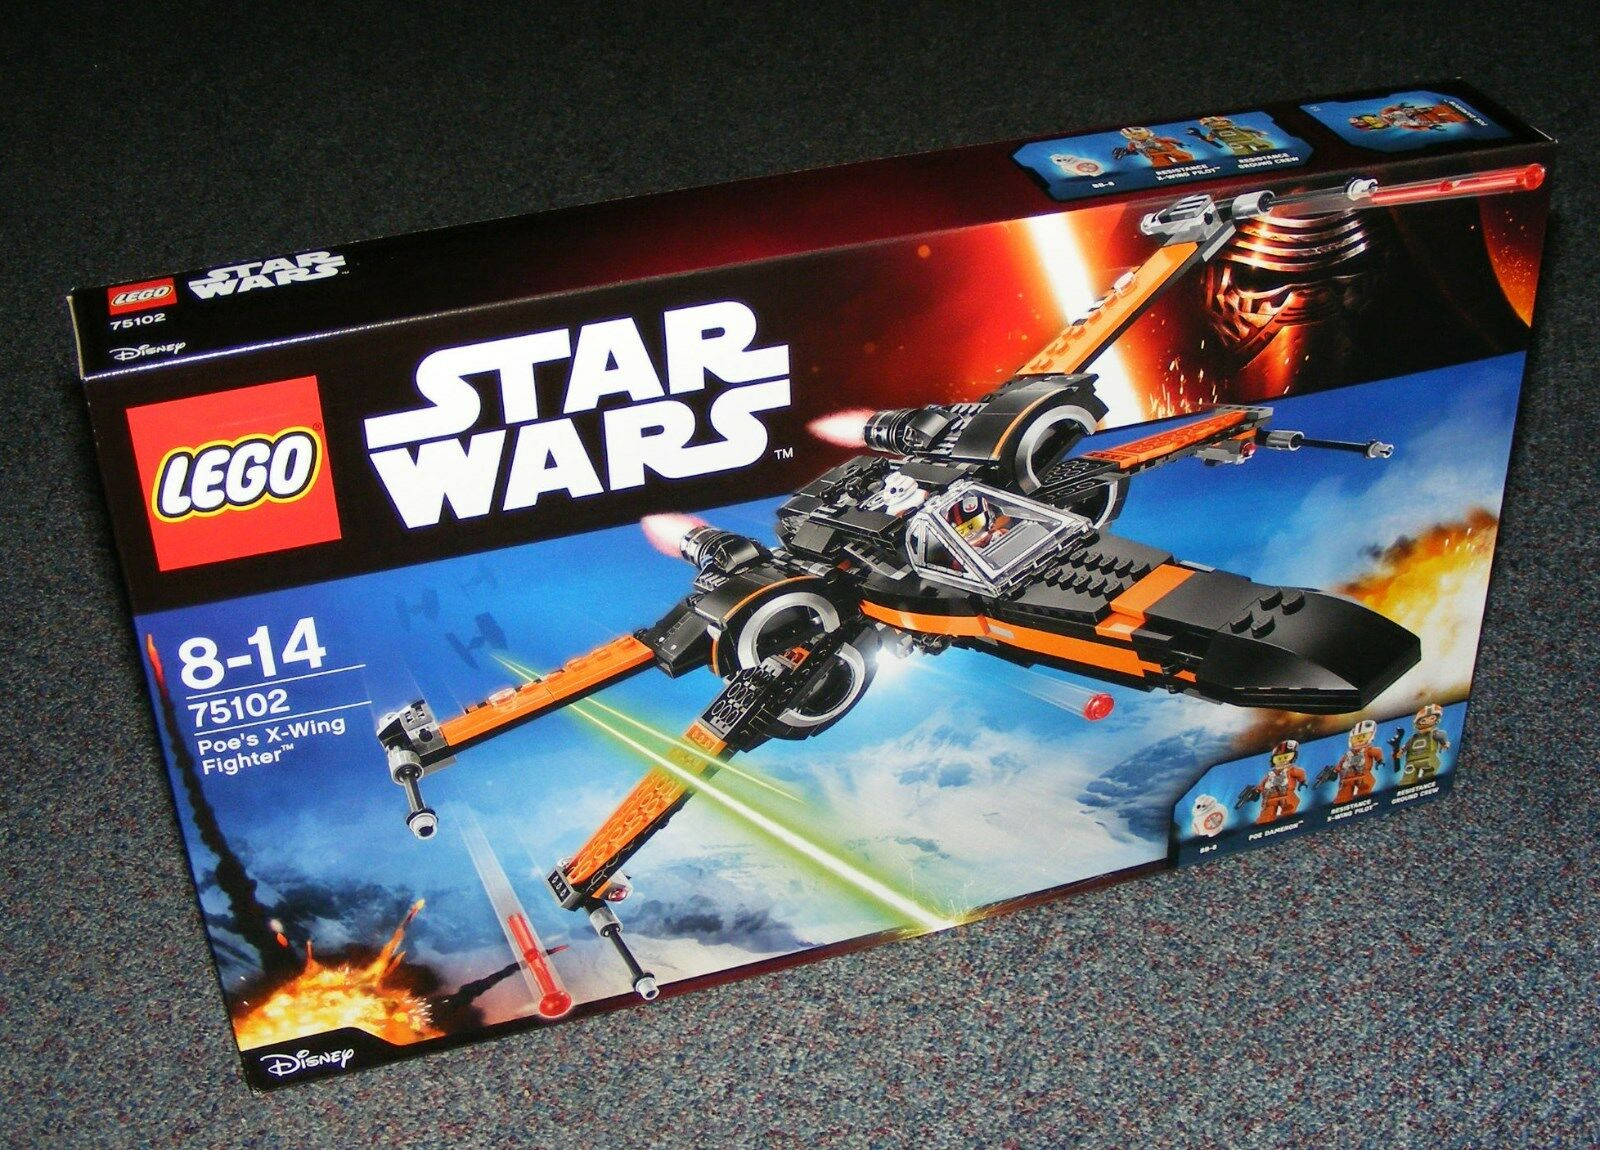 STAR WARS LEGO 75102 Poe's x-wing Fighter Neuf scellé Entièrement neuf dans sa boîte